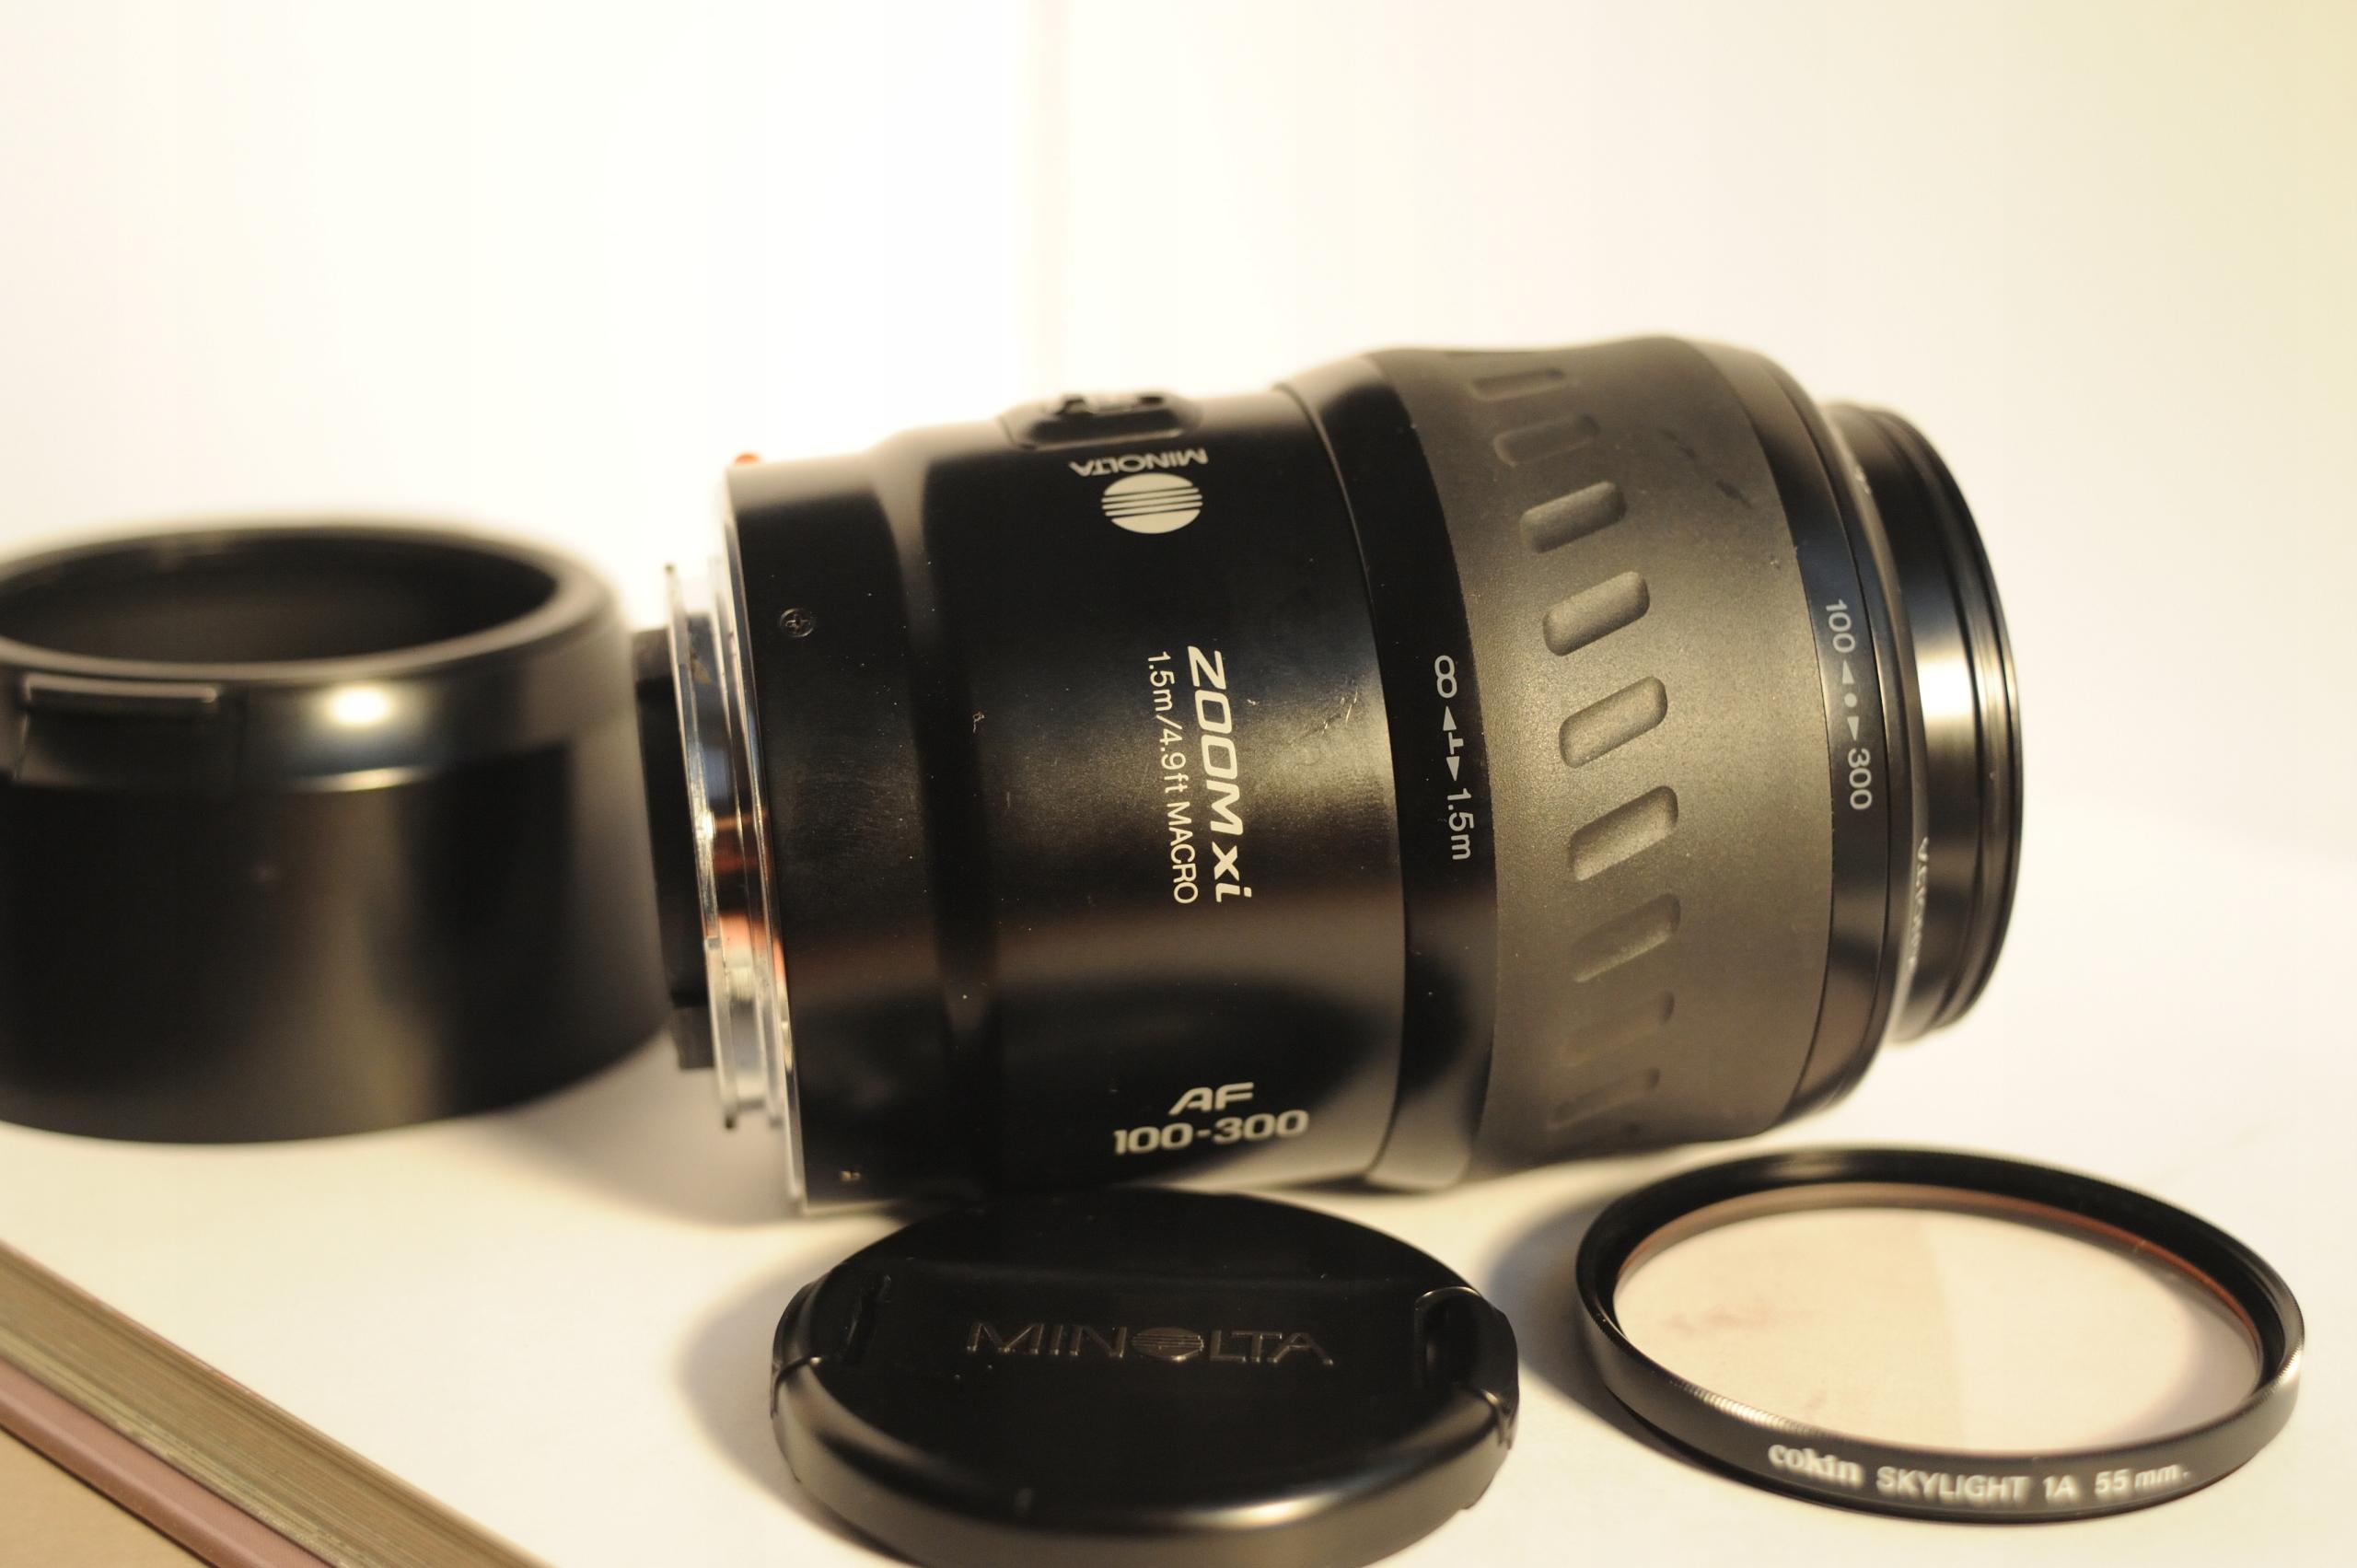 Minolta AF 100-300 Xi 4,5-5,6 + filtr + osłona